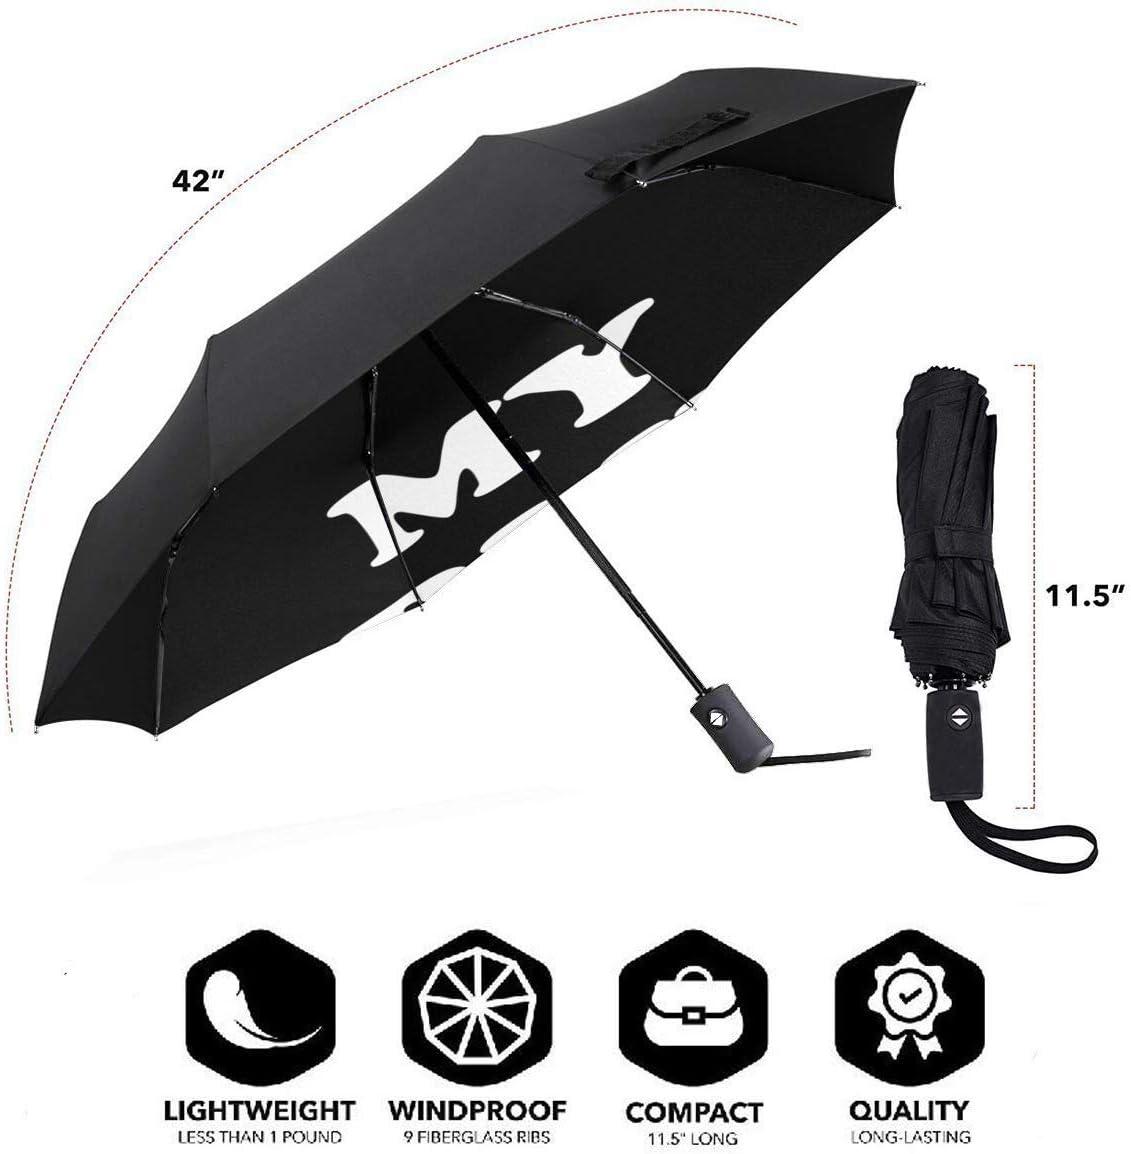 My Sibling Has Paws Automatic Tri-Fold Umbrella Parasol Sun Umbrella Sunshade